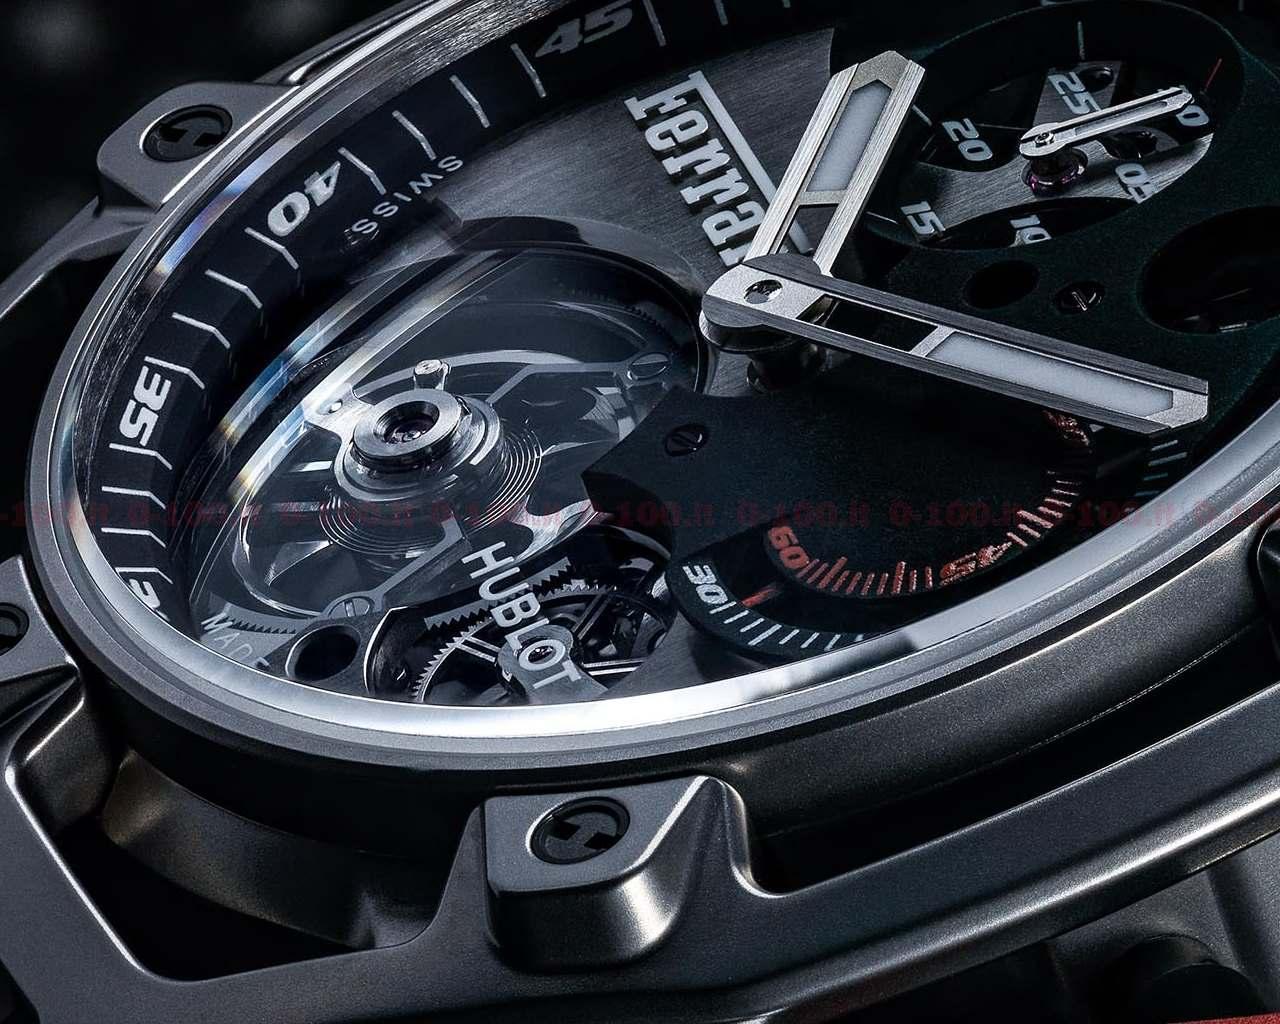 Hublot Techframe Ferrari 70 Years Tourbillon Chronograph Limited Edition_prezzo_price_0-10015